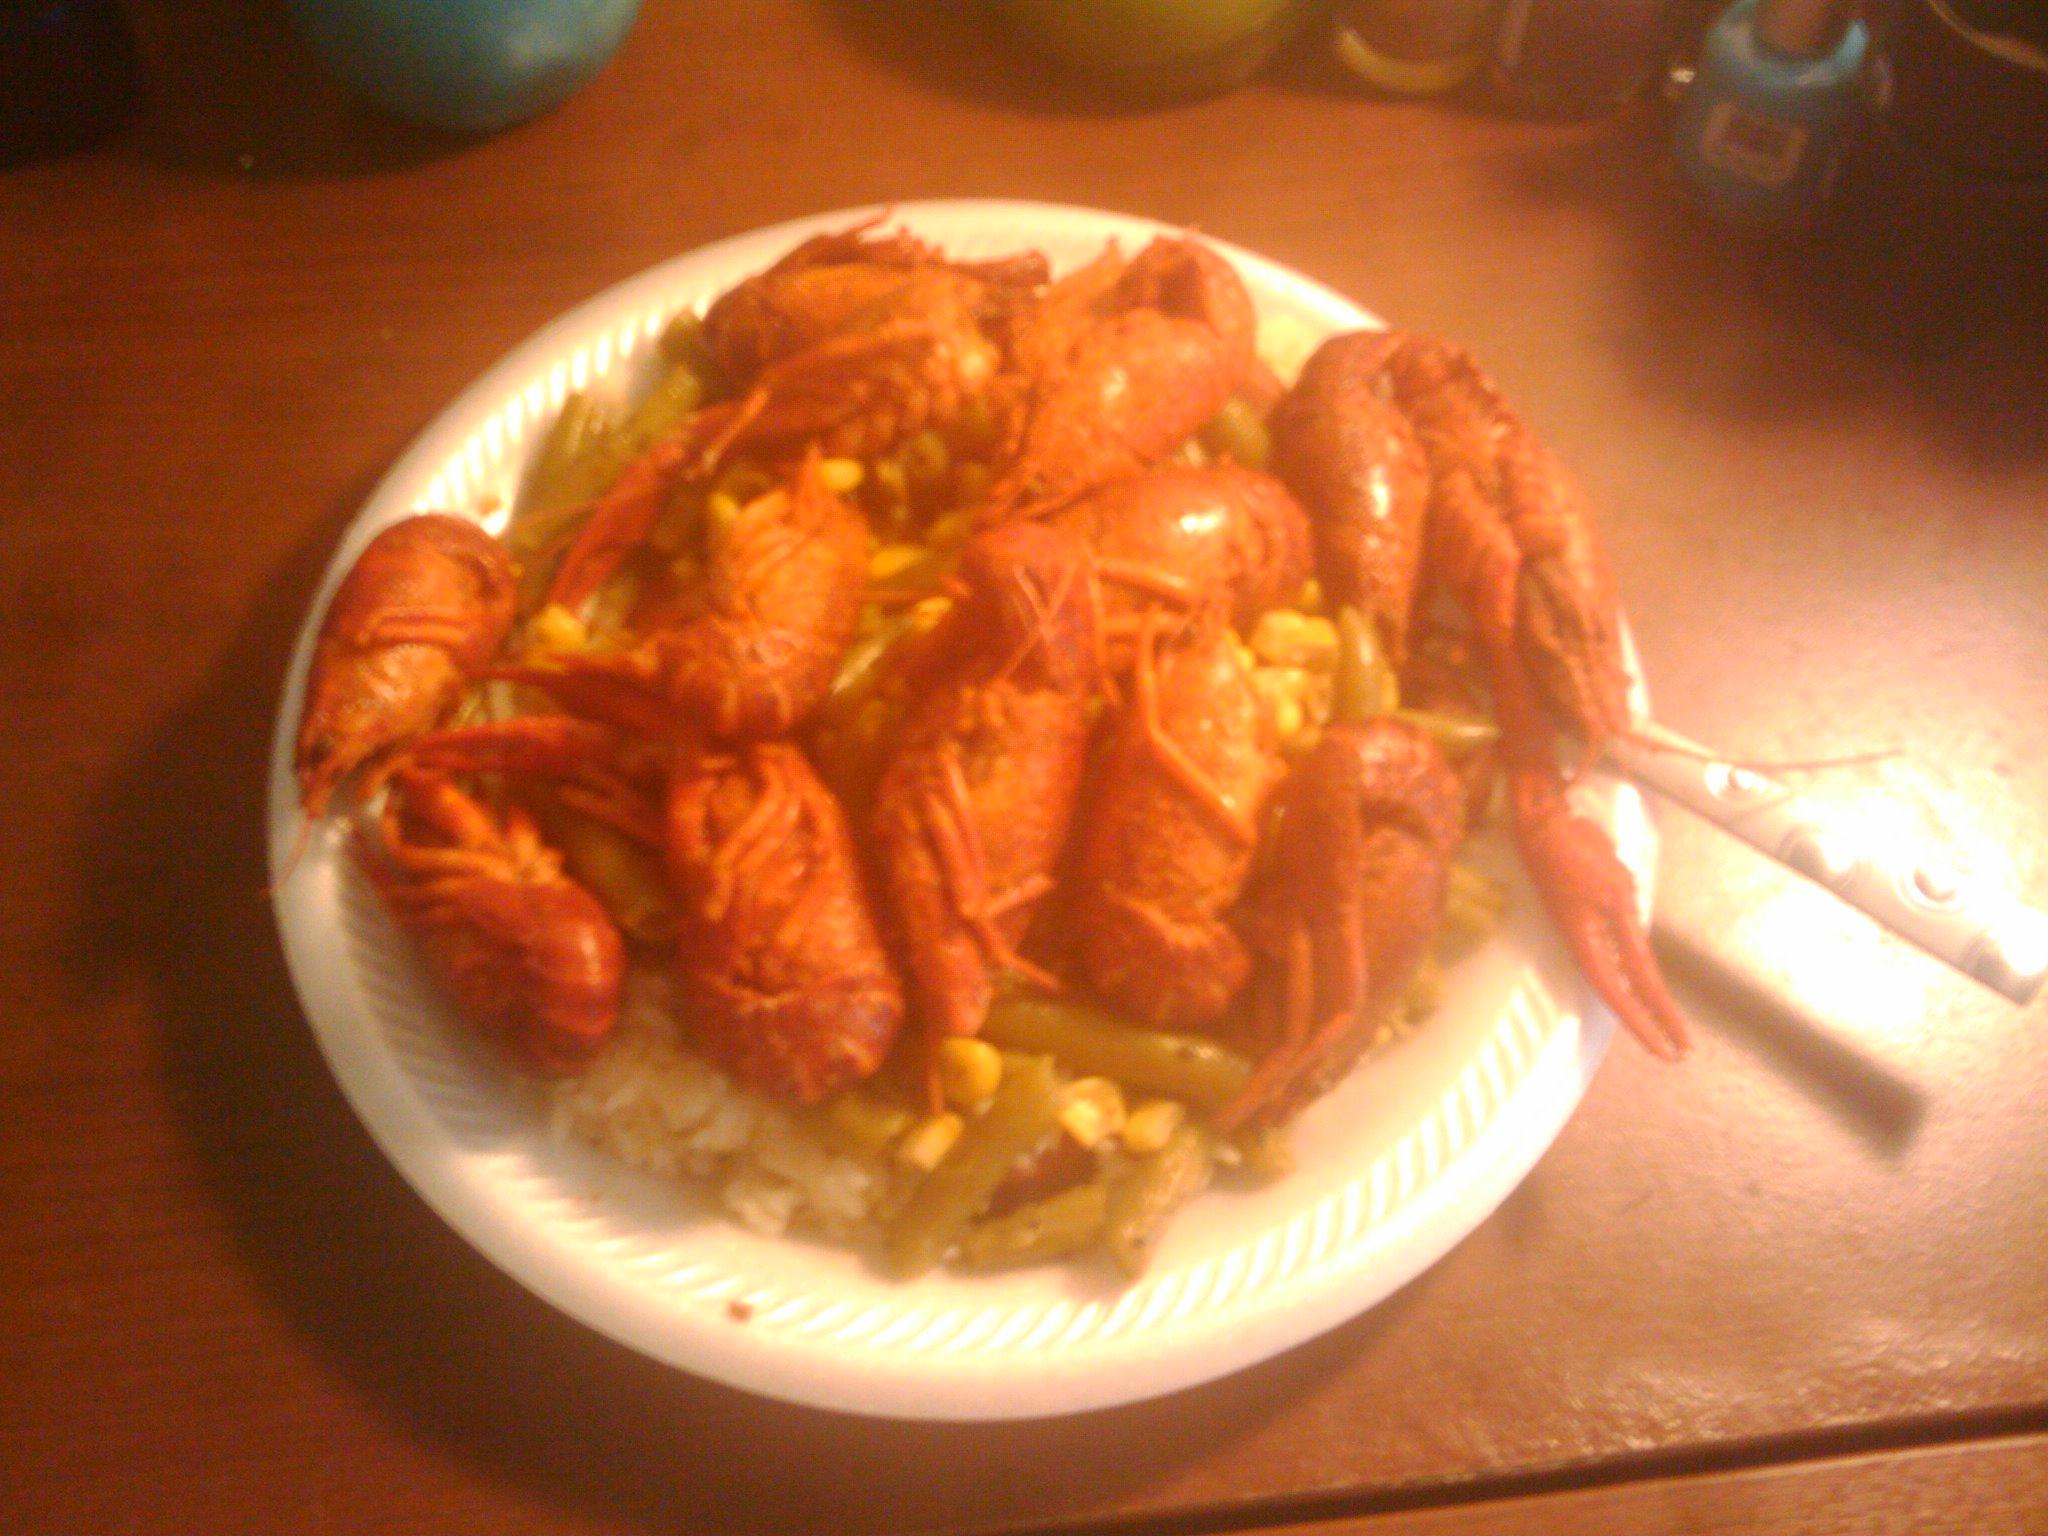 my house :: crawfish rice corn greenbeans sausaga made by me yumm!!#